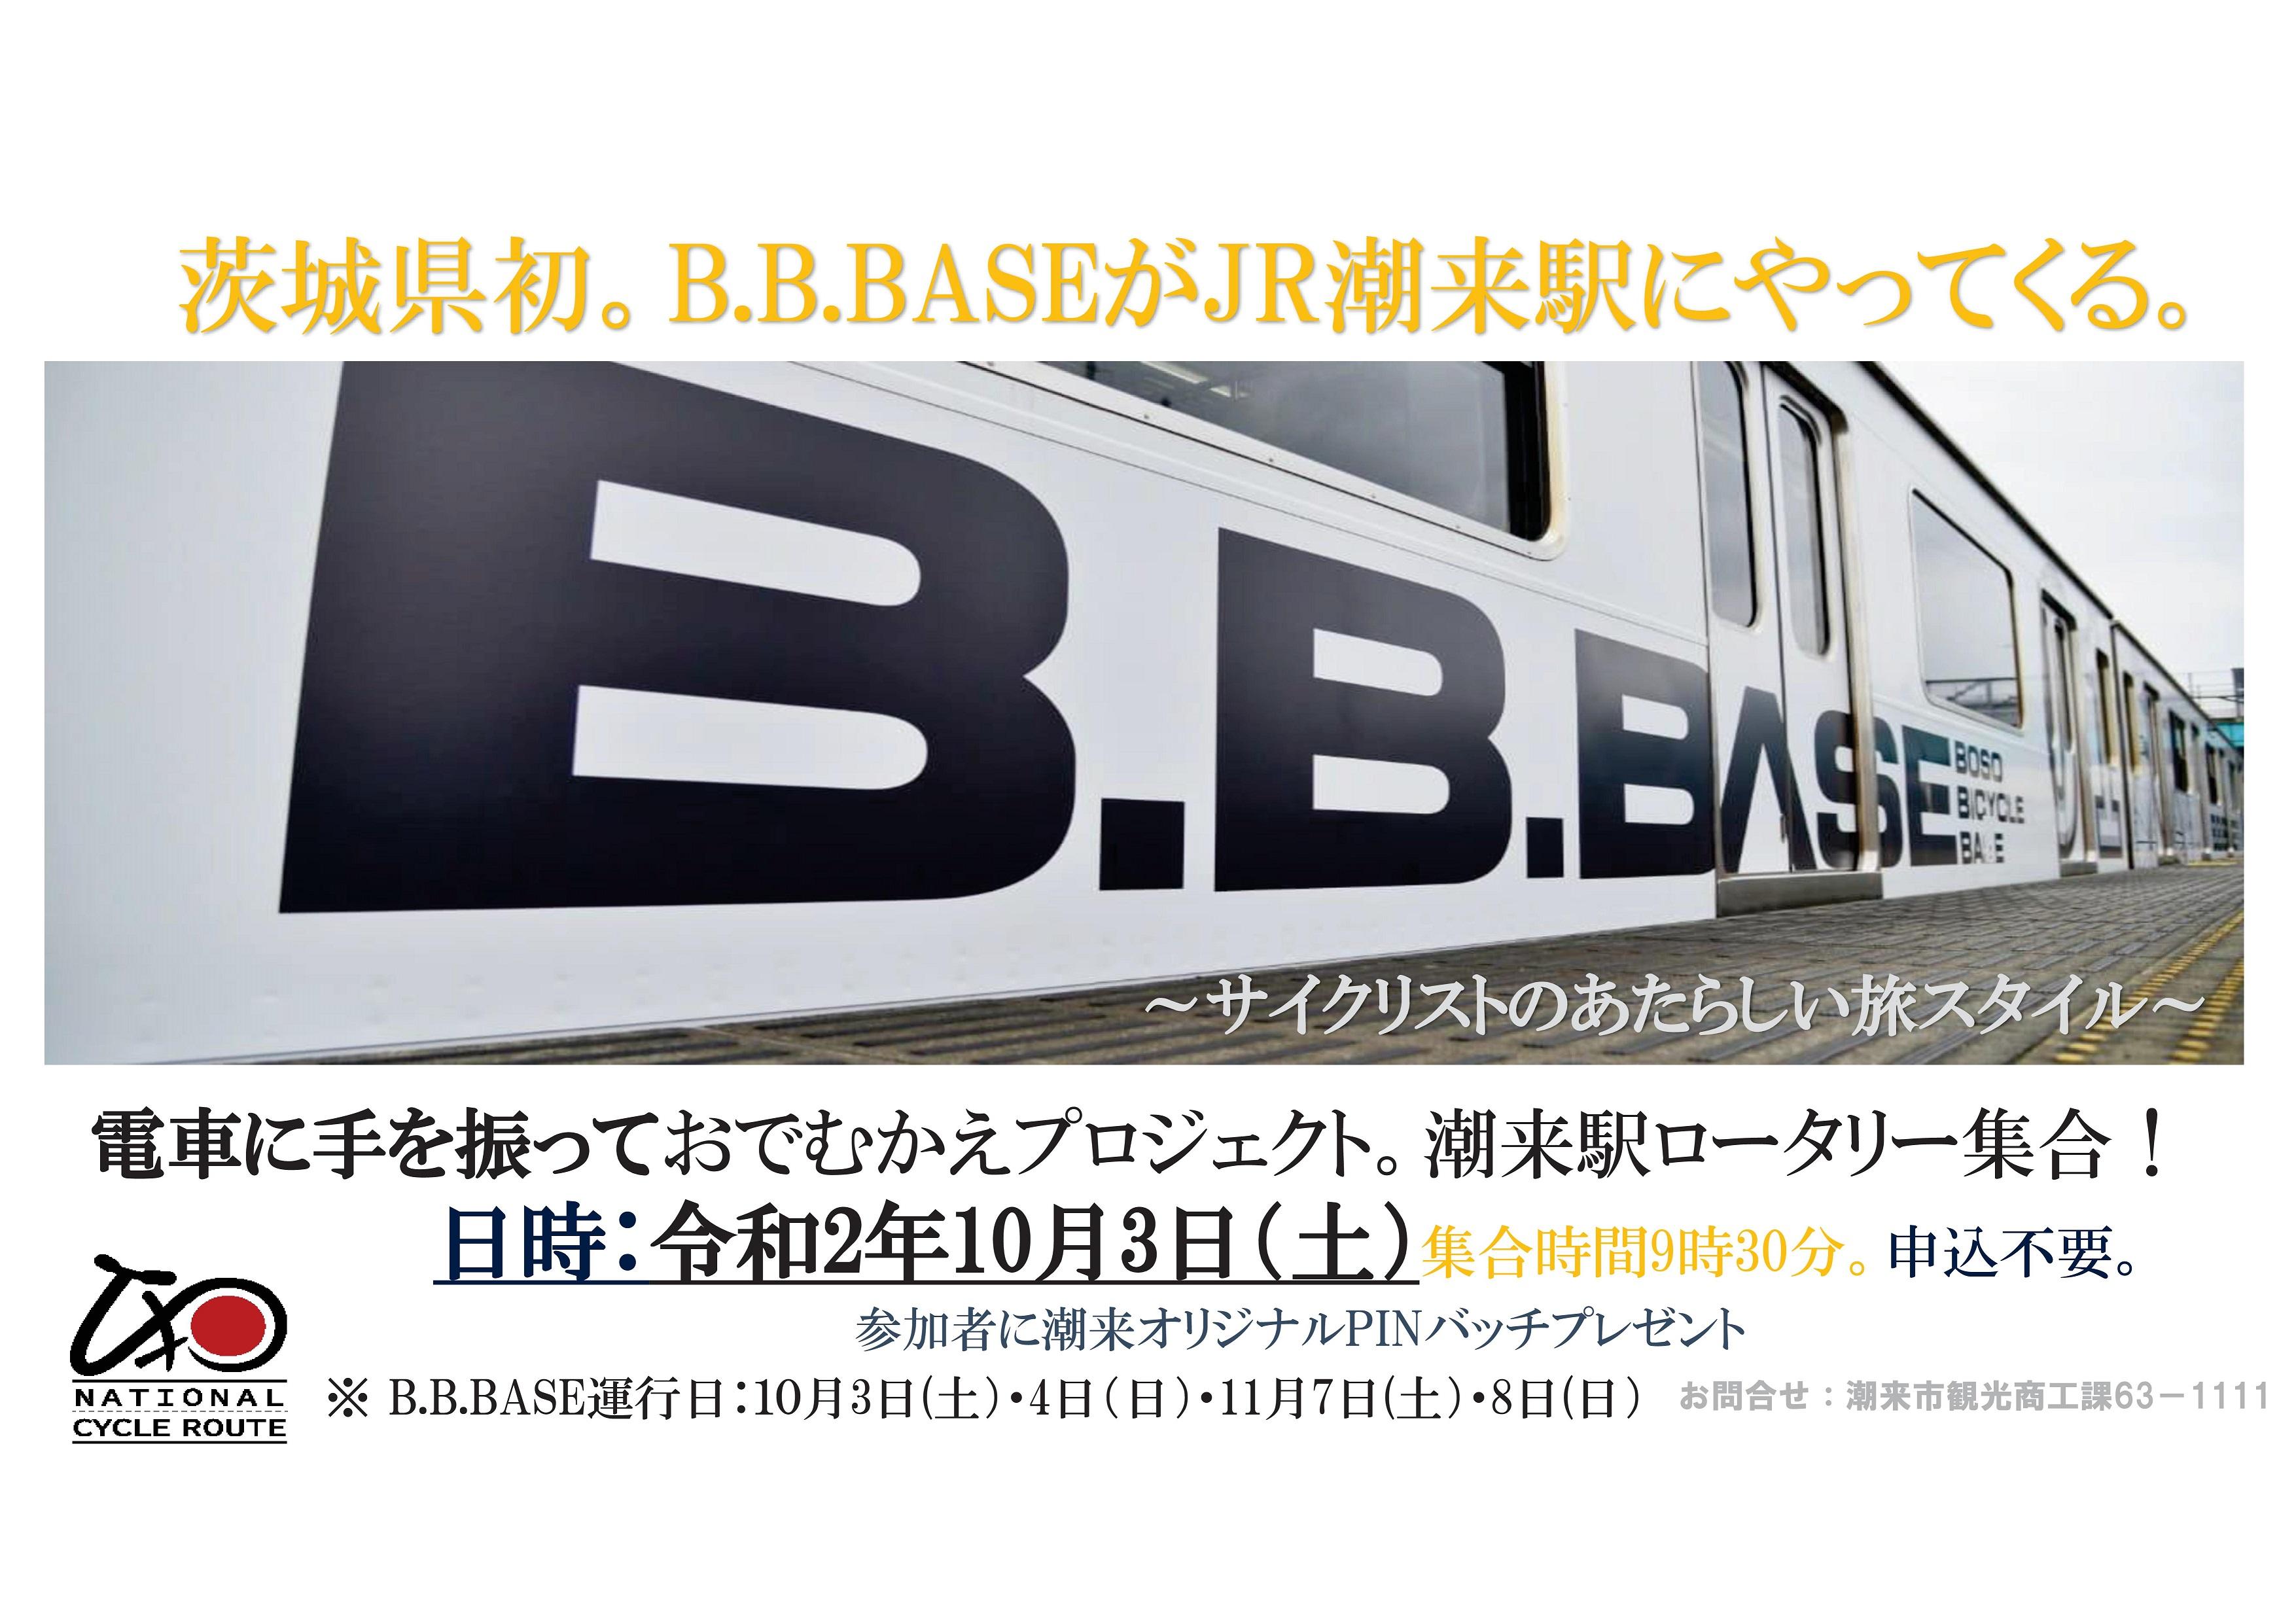 BBBASE2